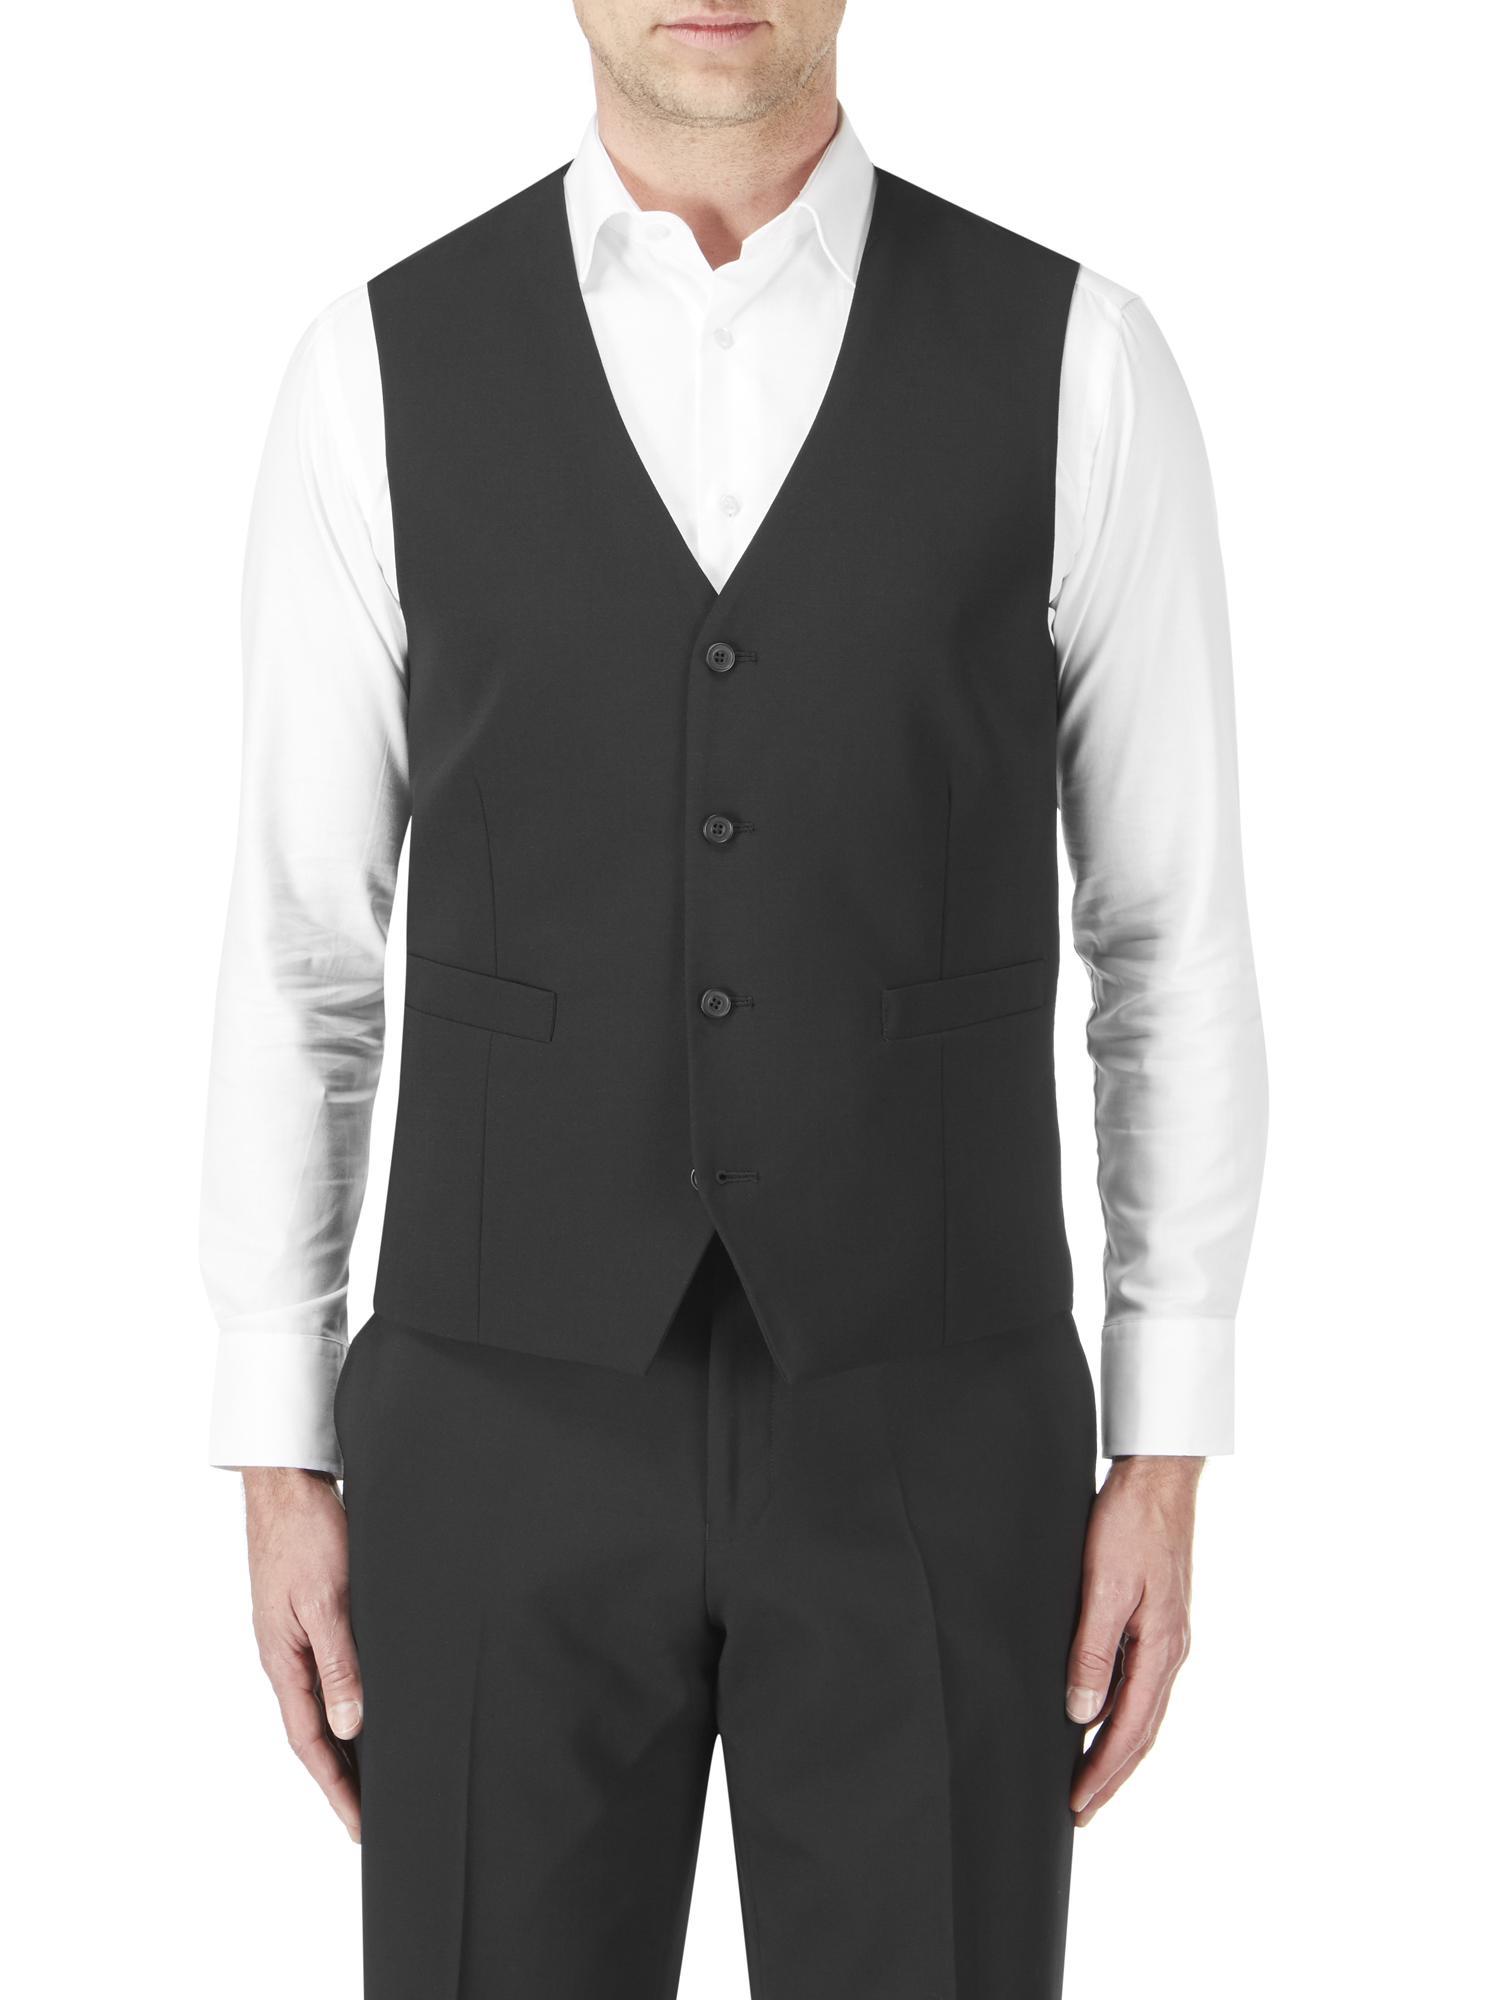 mm1327-darwin-black-waistcoat-1.jpg